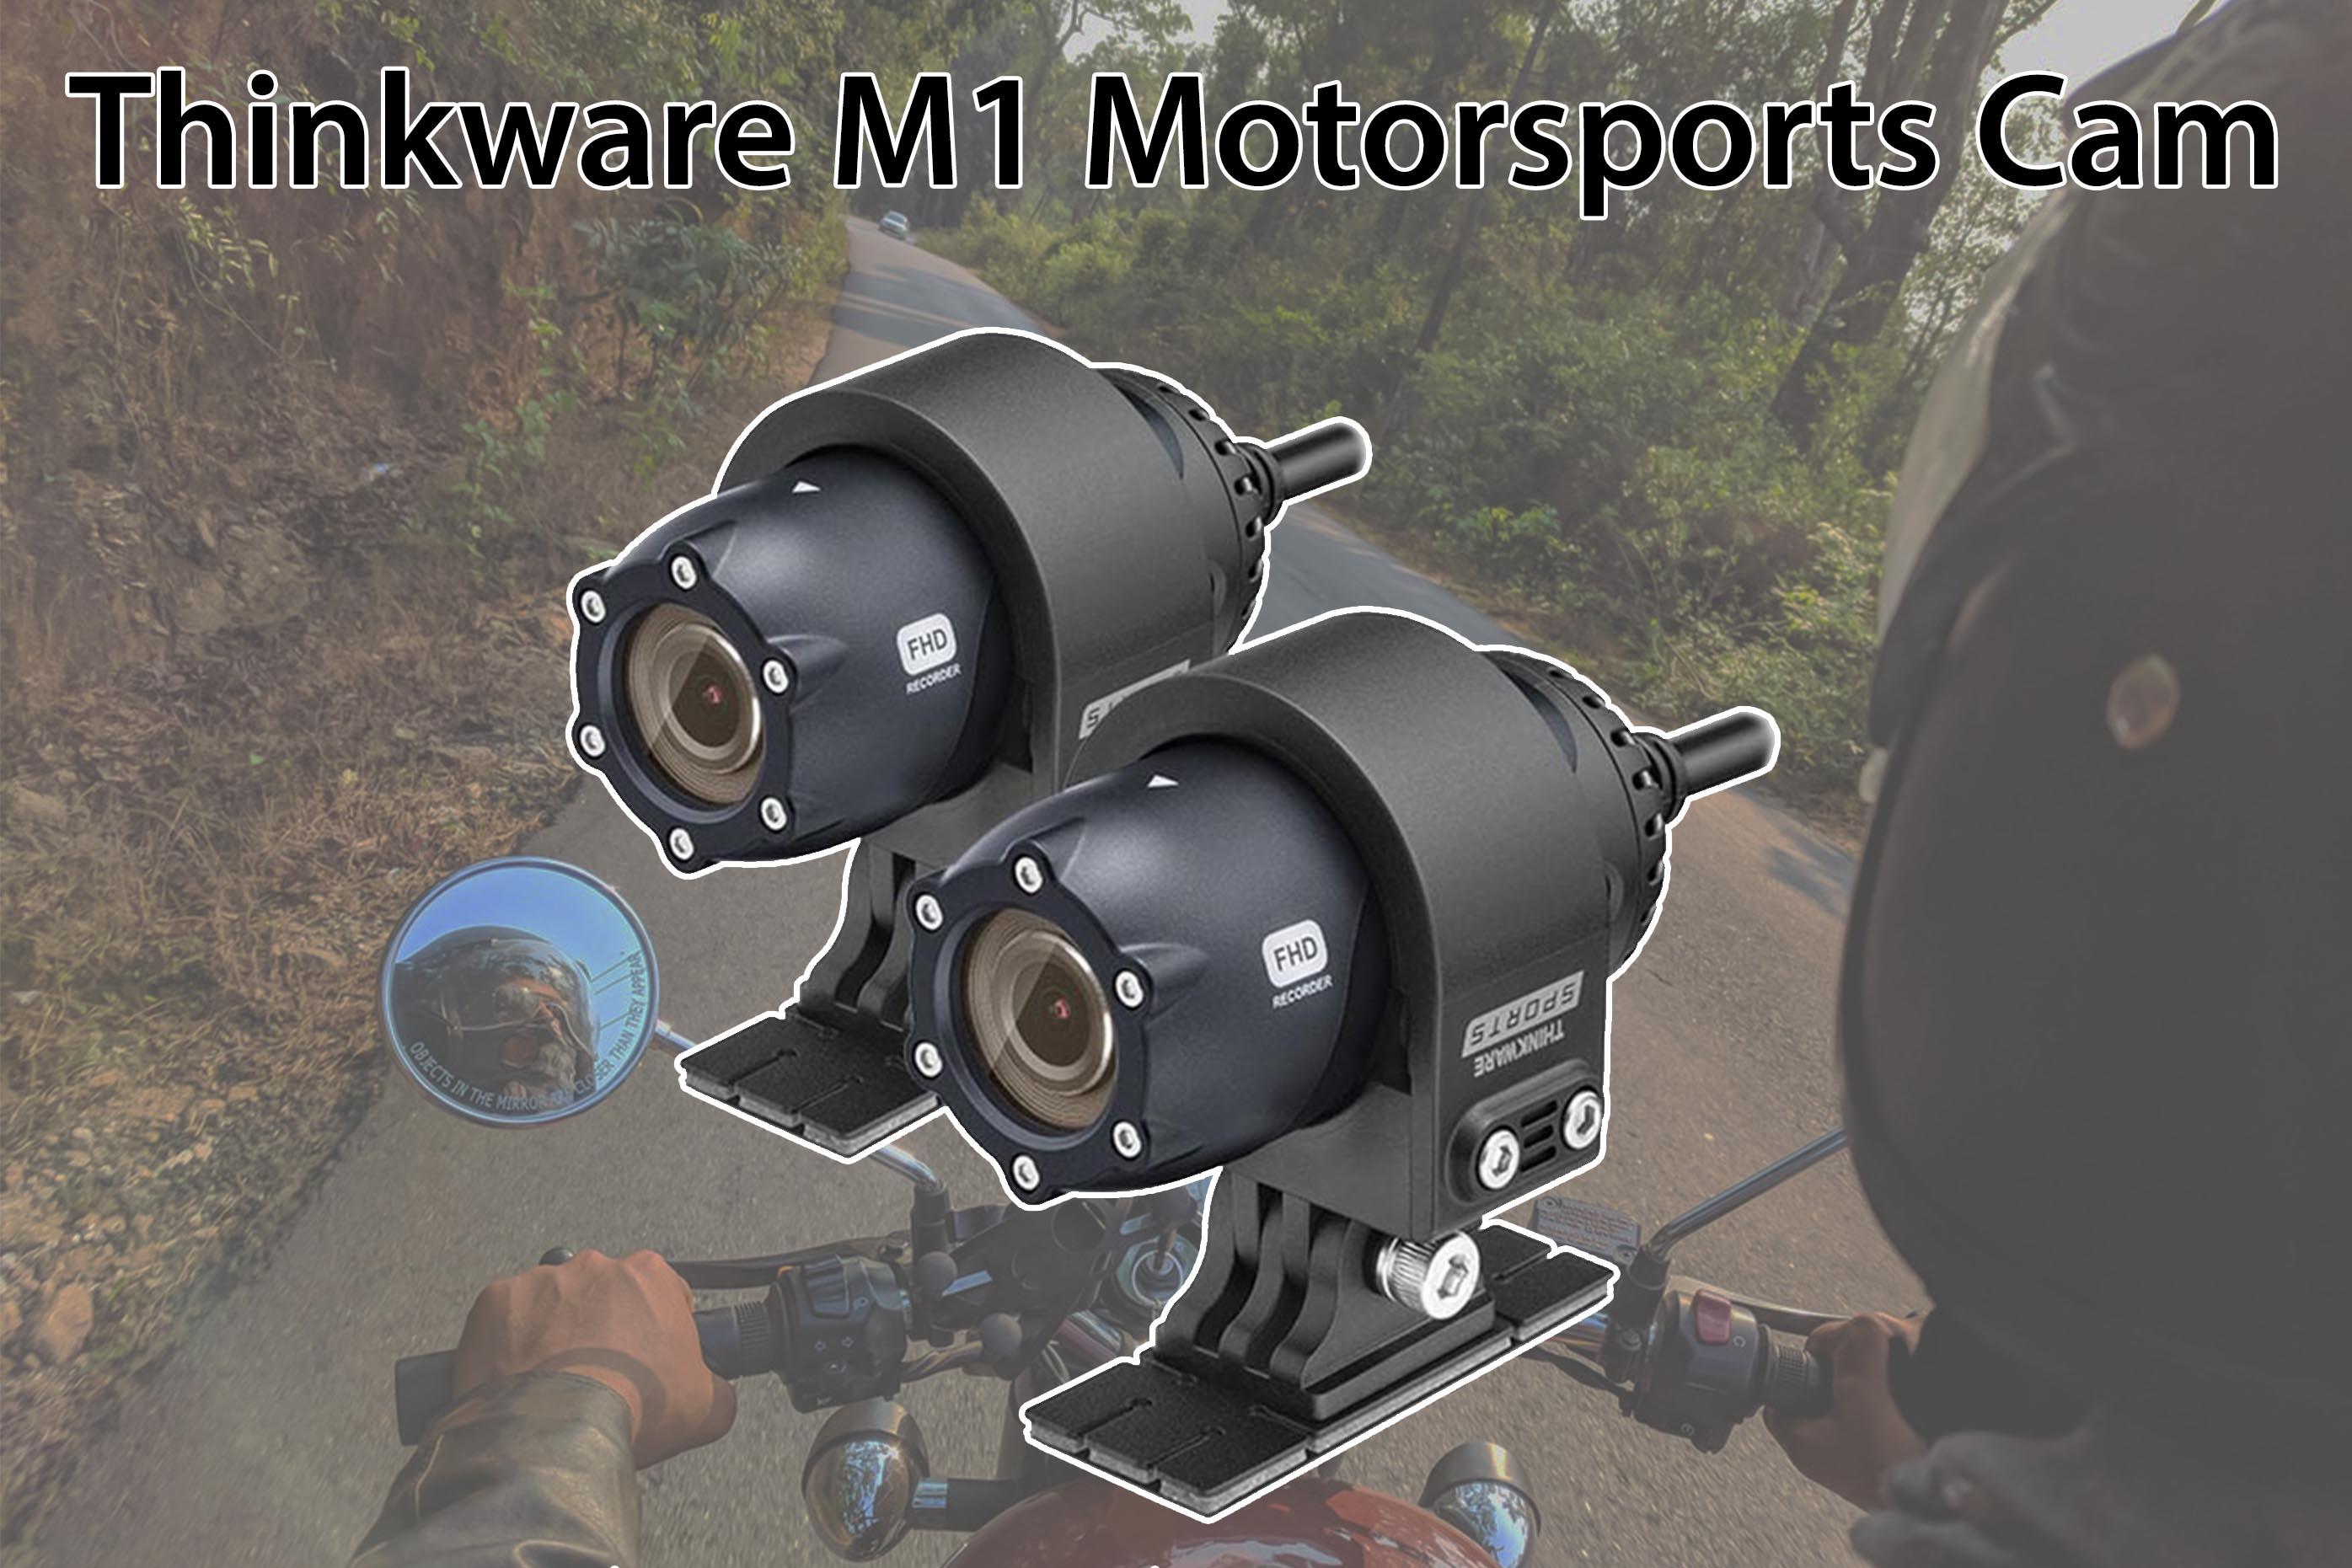 Thinkware M1 Motorsports Cam Review Details